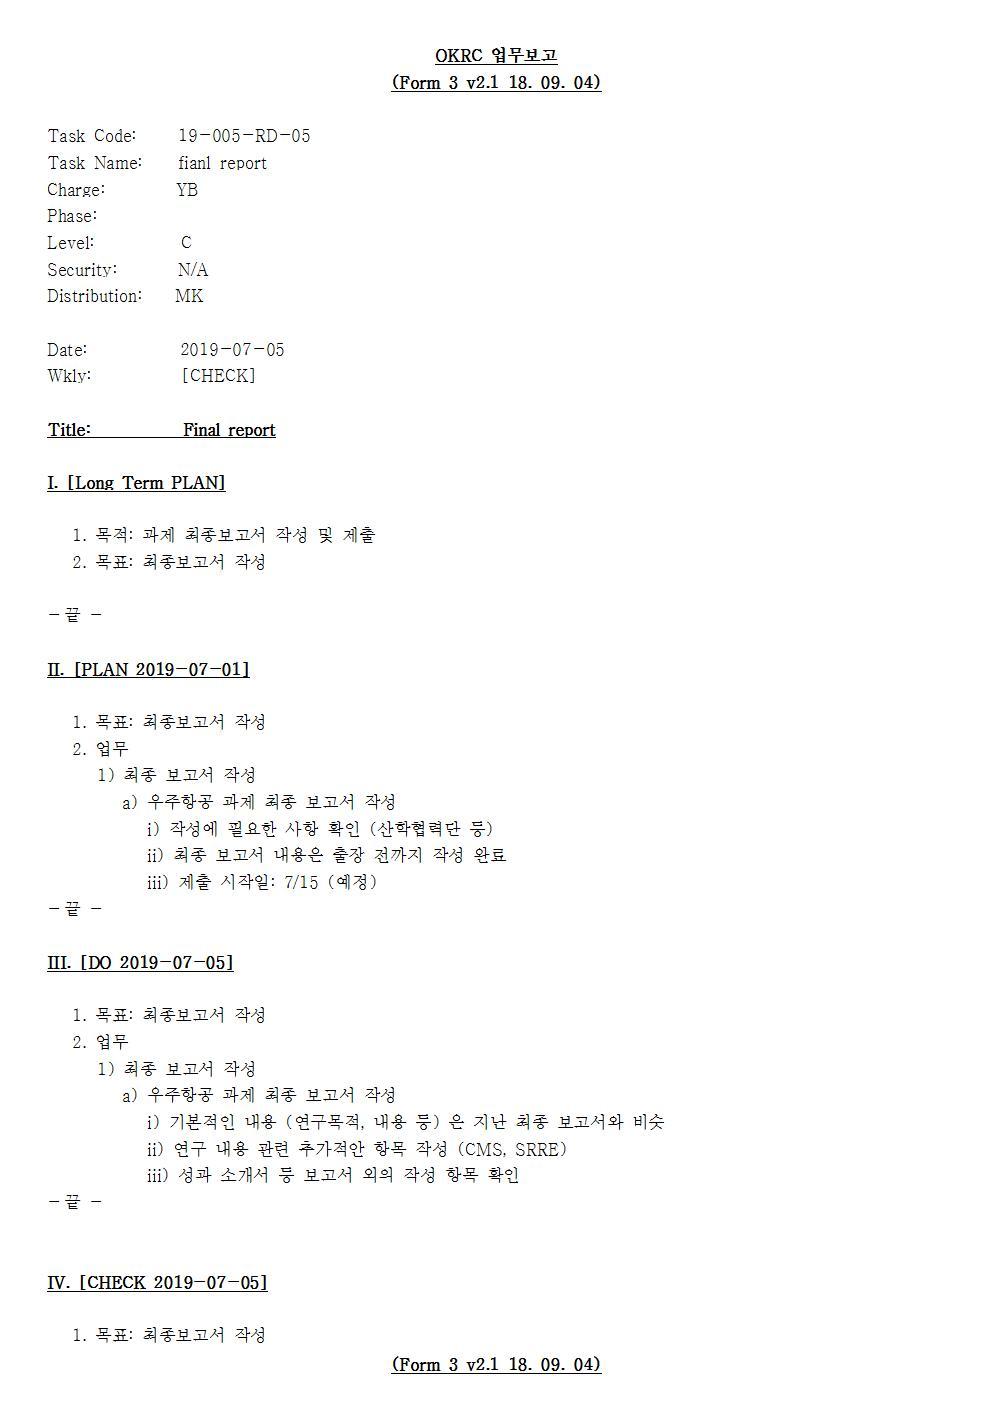 D-[19-005-RD-05]-[final report]-[2019-07-05][YB]-[19-7-1]-[P+D+C]001.jpg